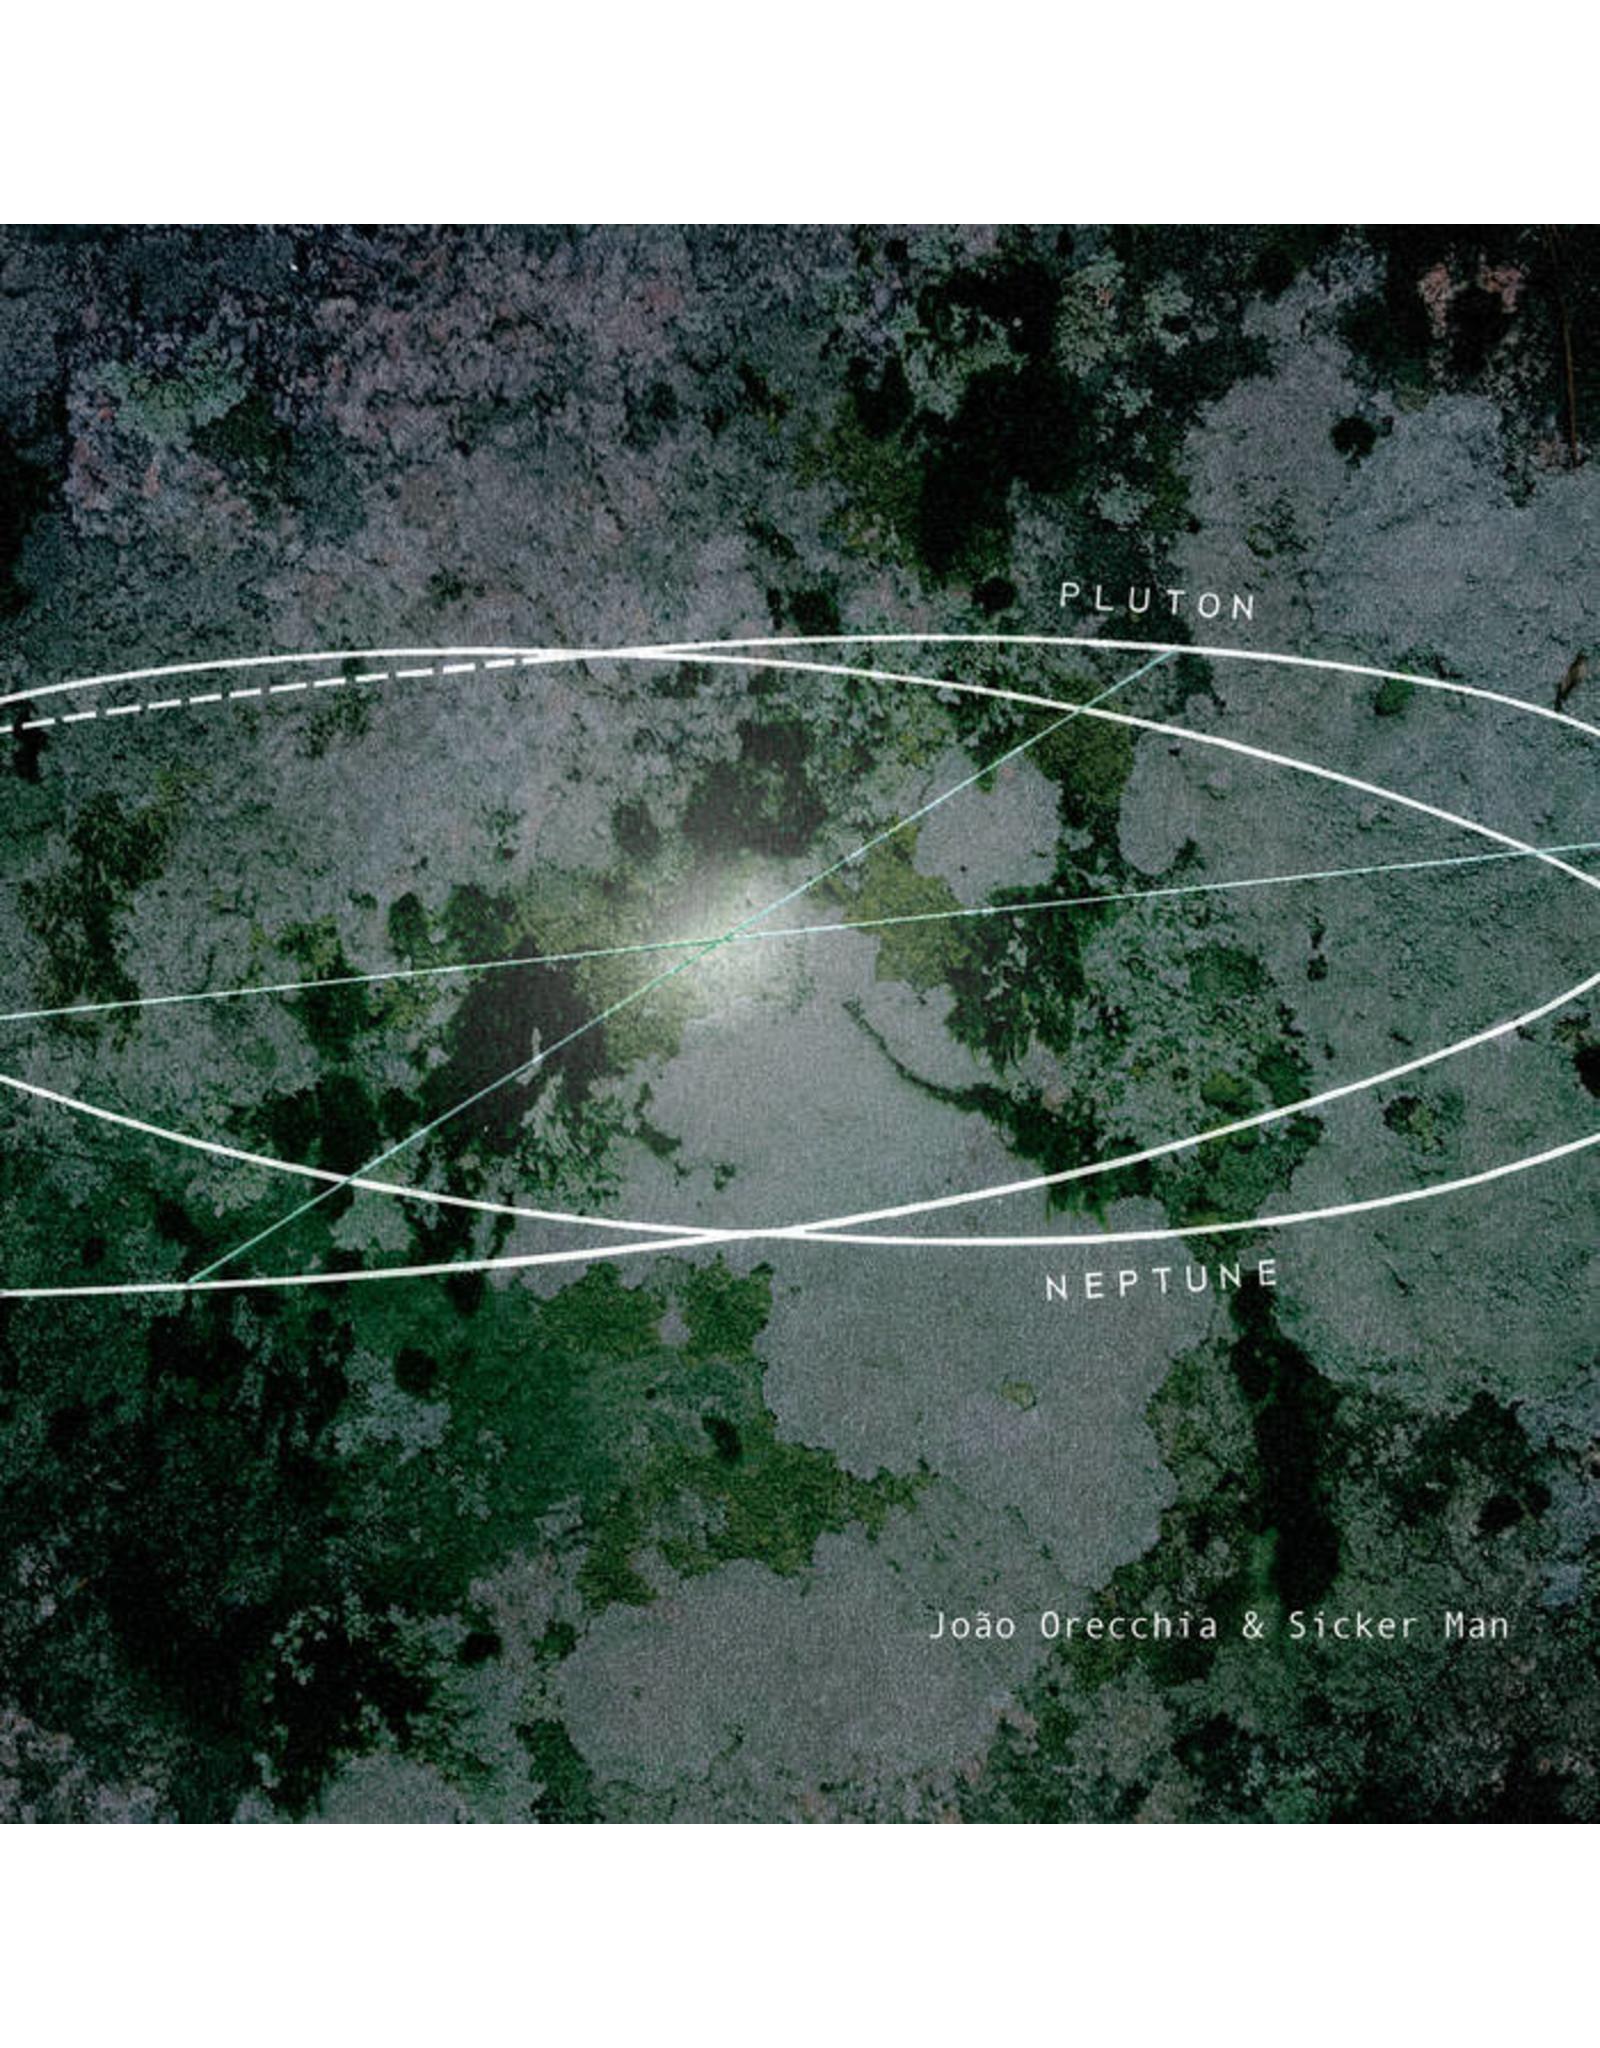 New Cassette Joao Orecchia & Sicker Man - Pluton/Neptune CS